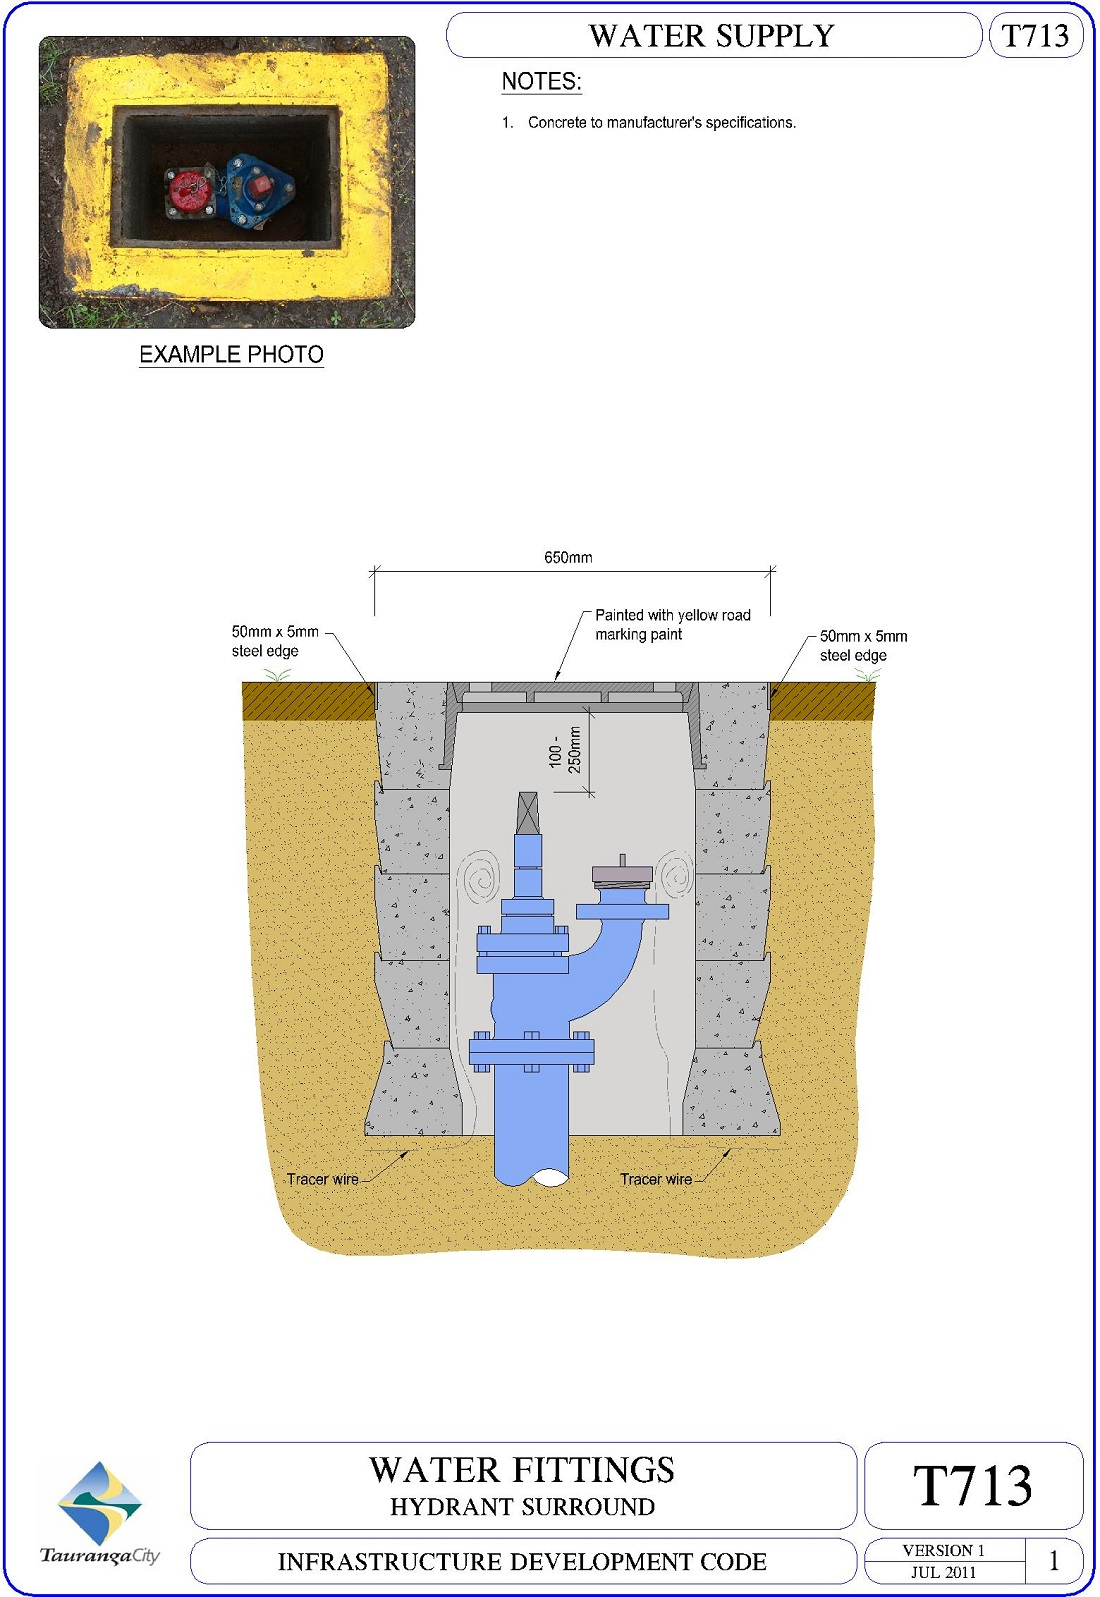 Hydrant Surround